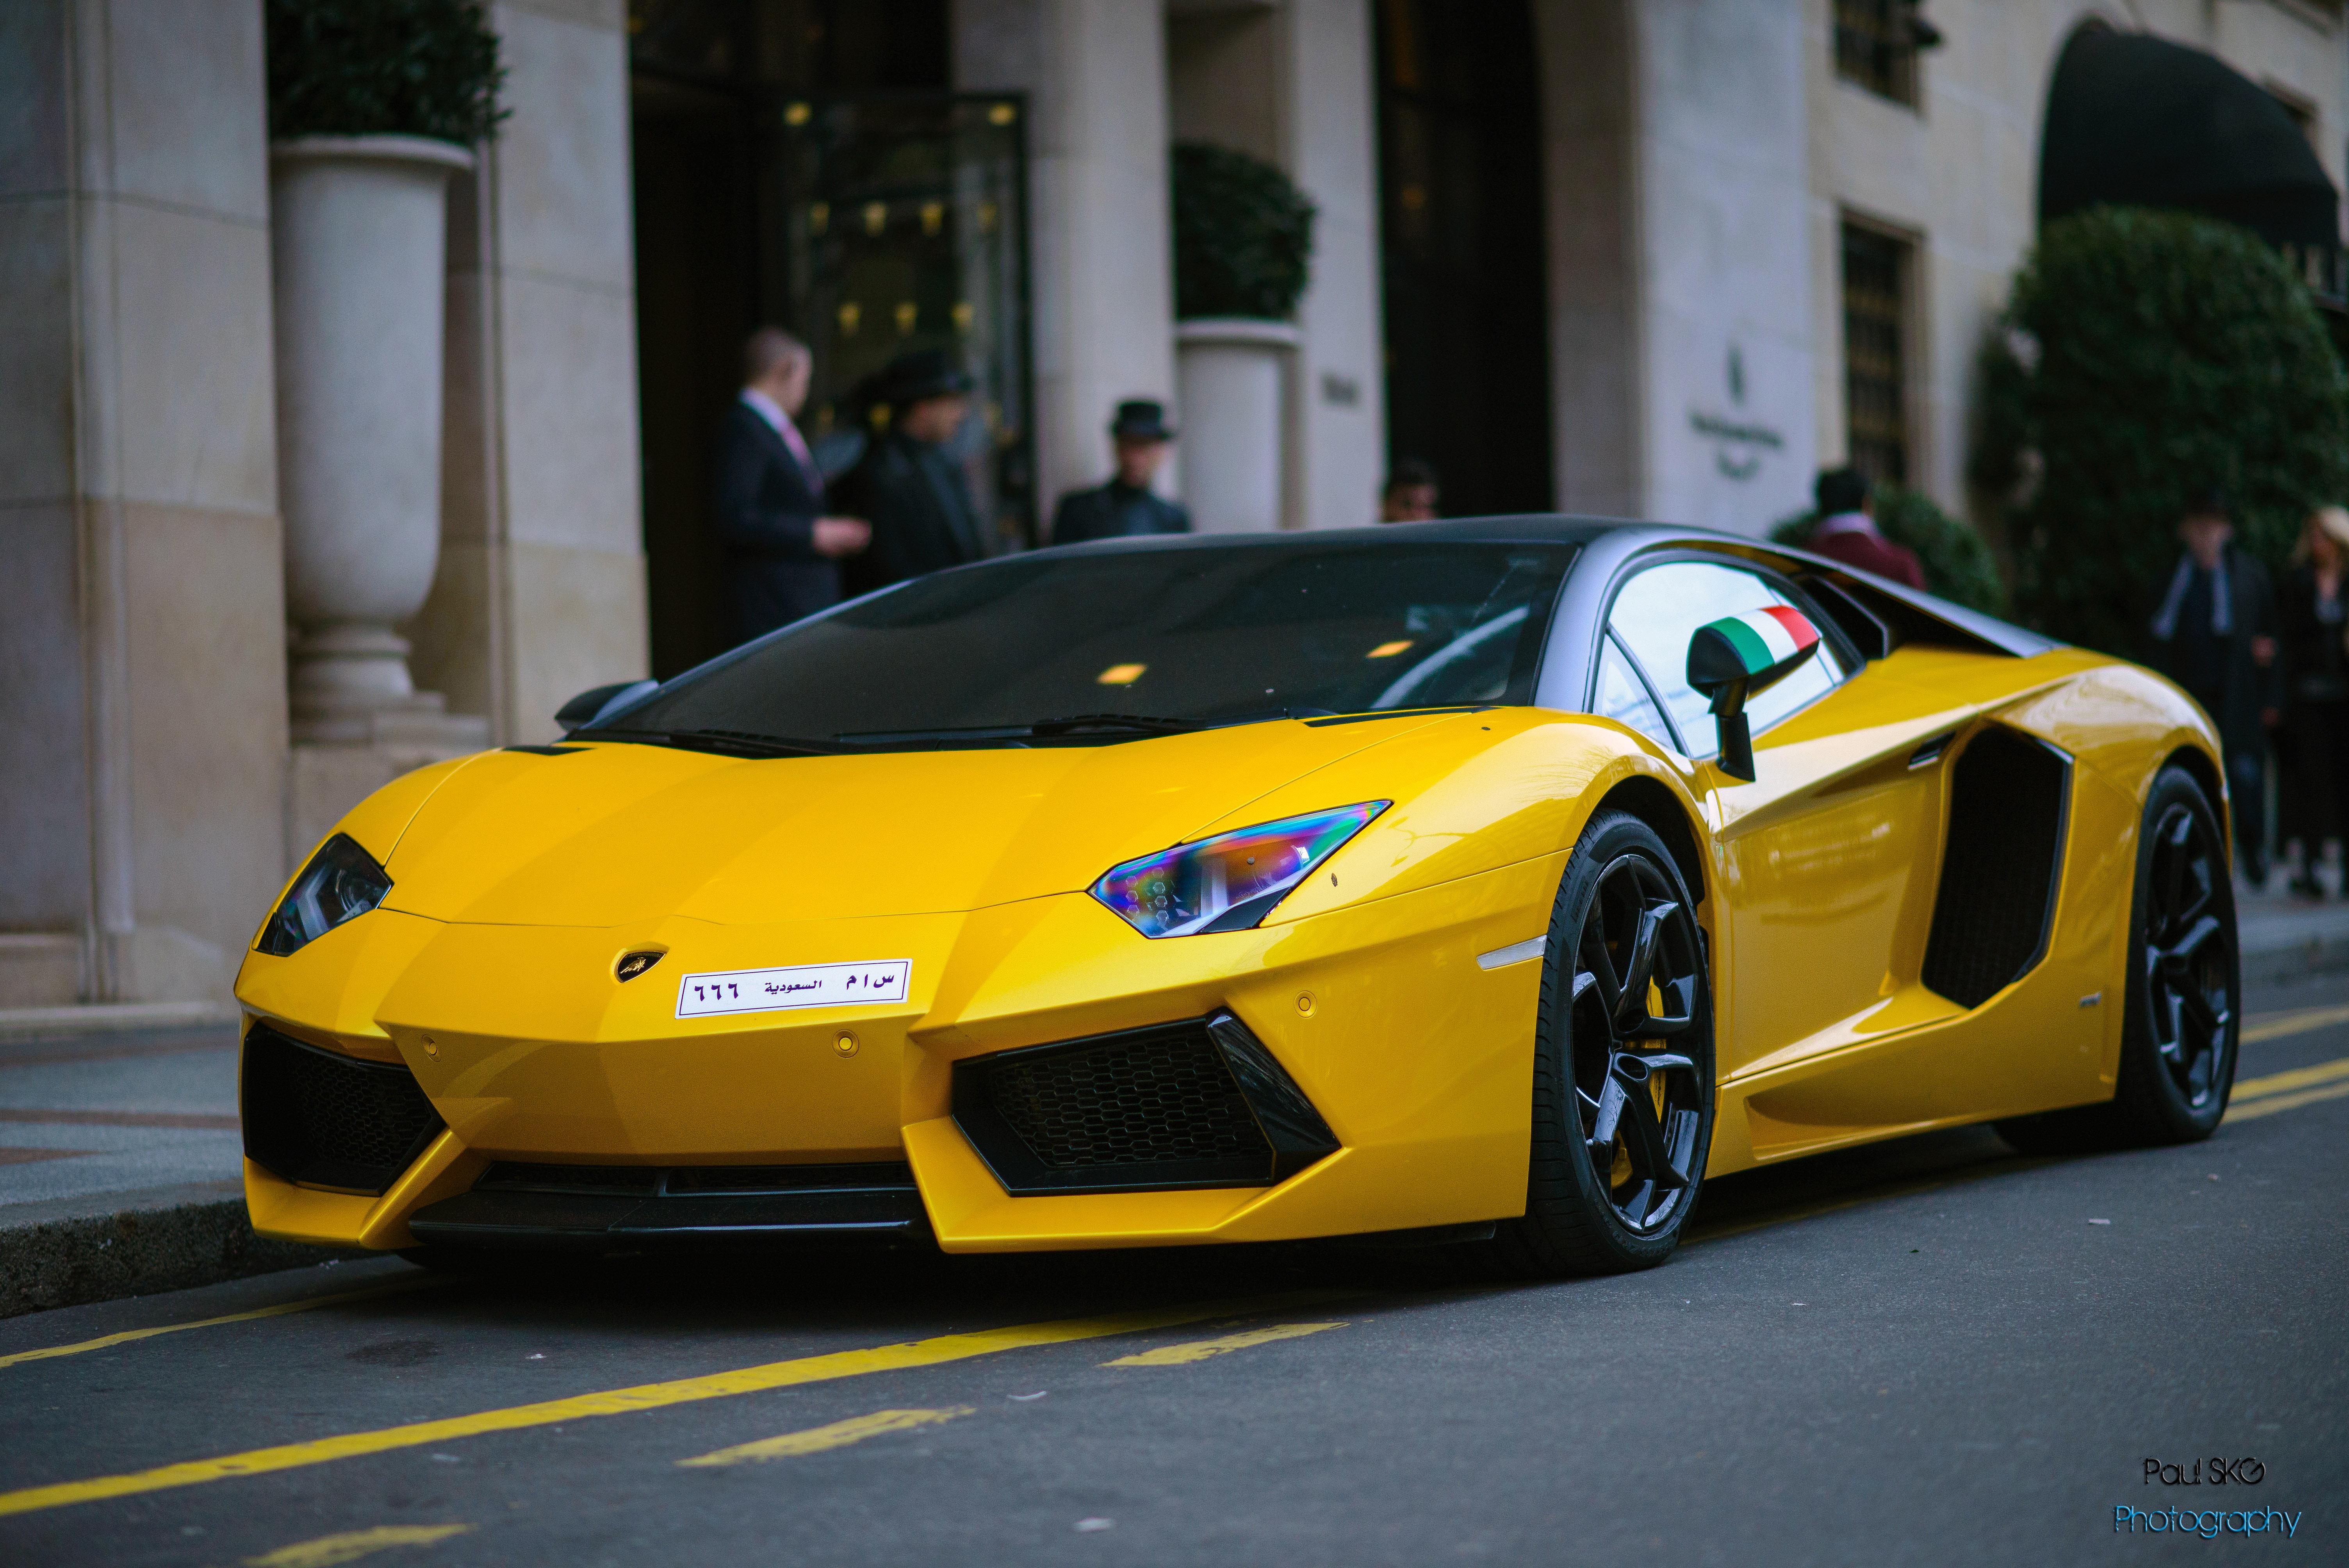 Wallpaper : black, sport, Lamborghini Aventador, Porsche, sports car